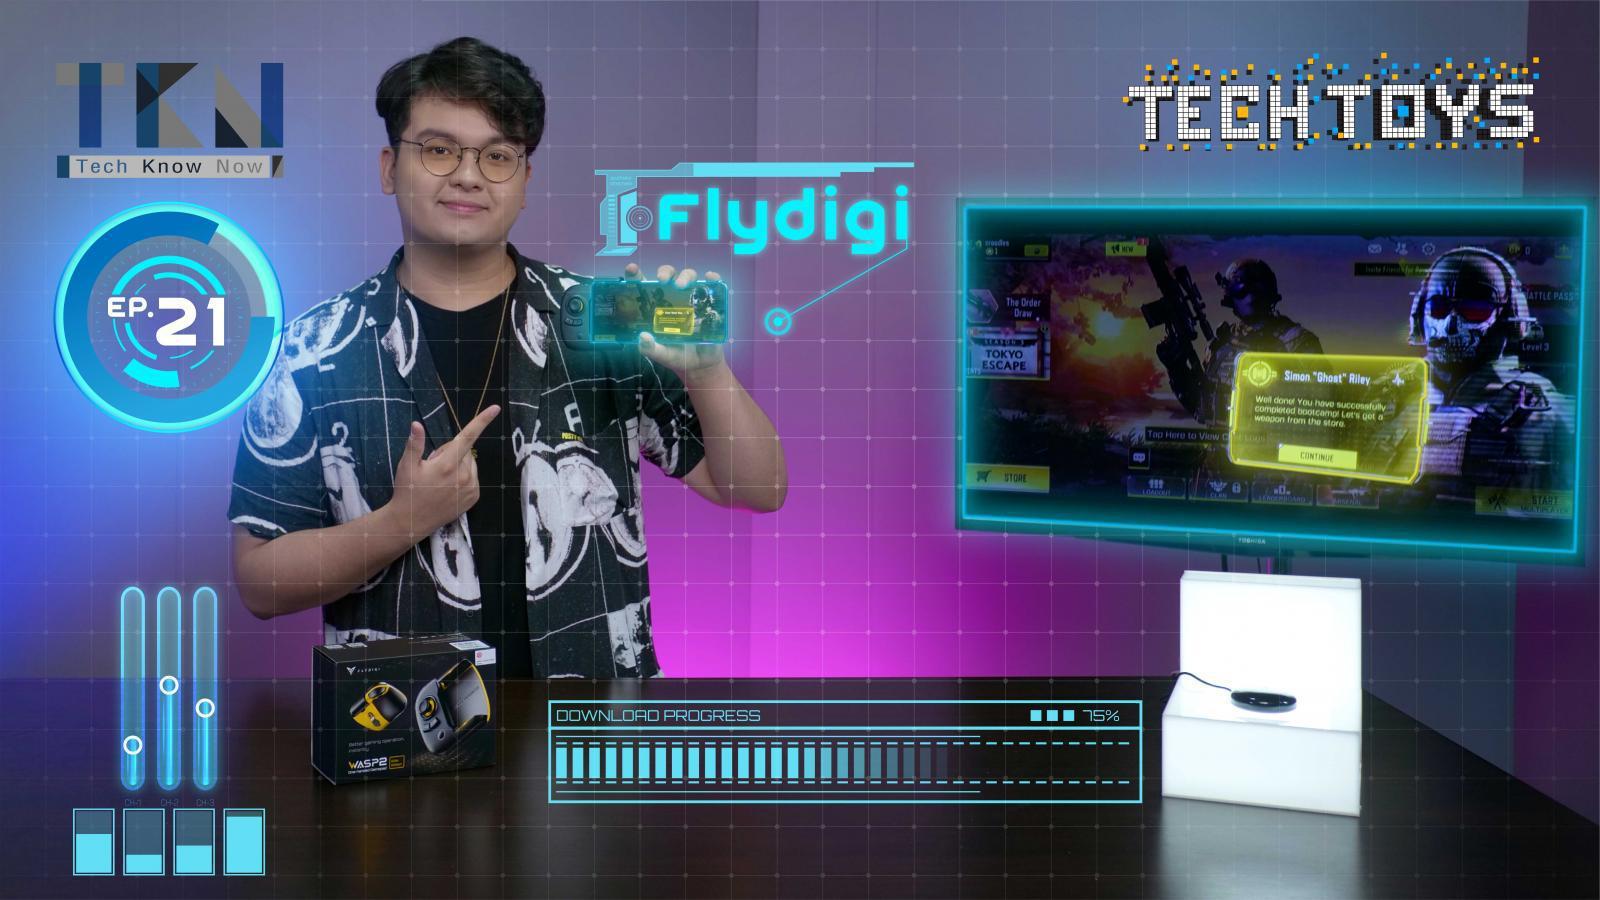 Tech Know Now EP.21 | จอยเกมส์ไร้สายสำหรับสมาร์ทโฟน | PPTV HD 36